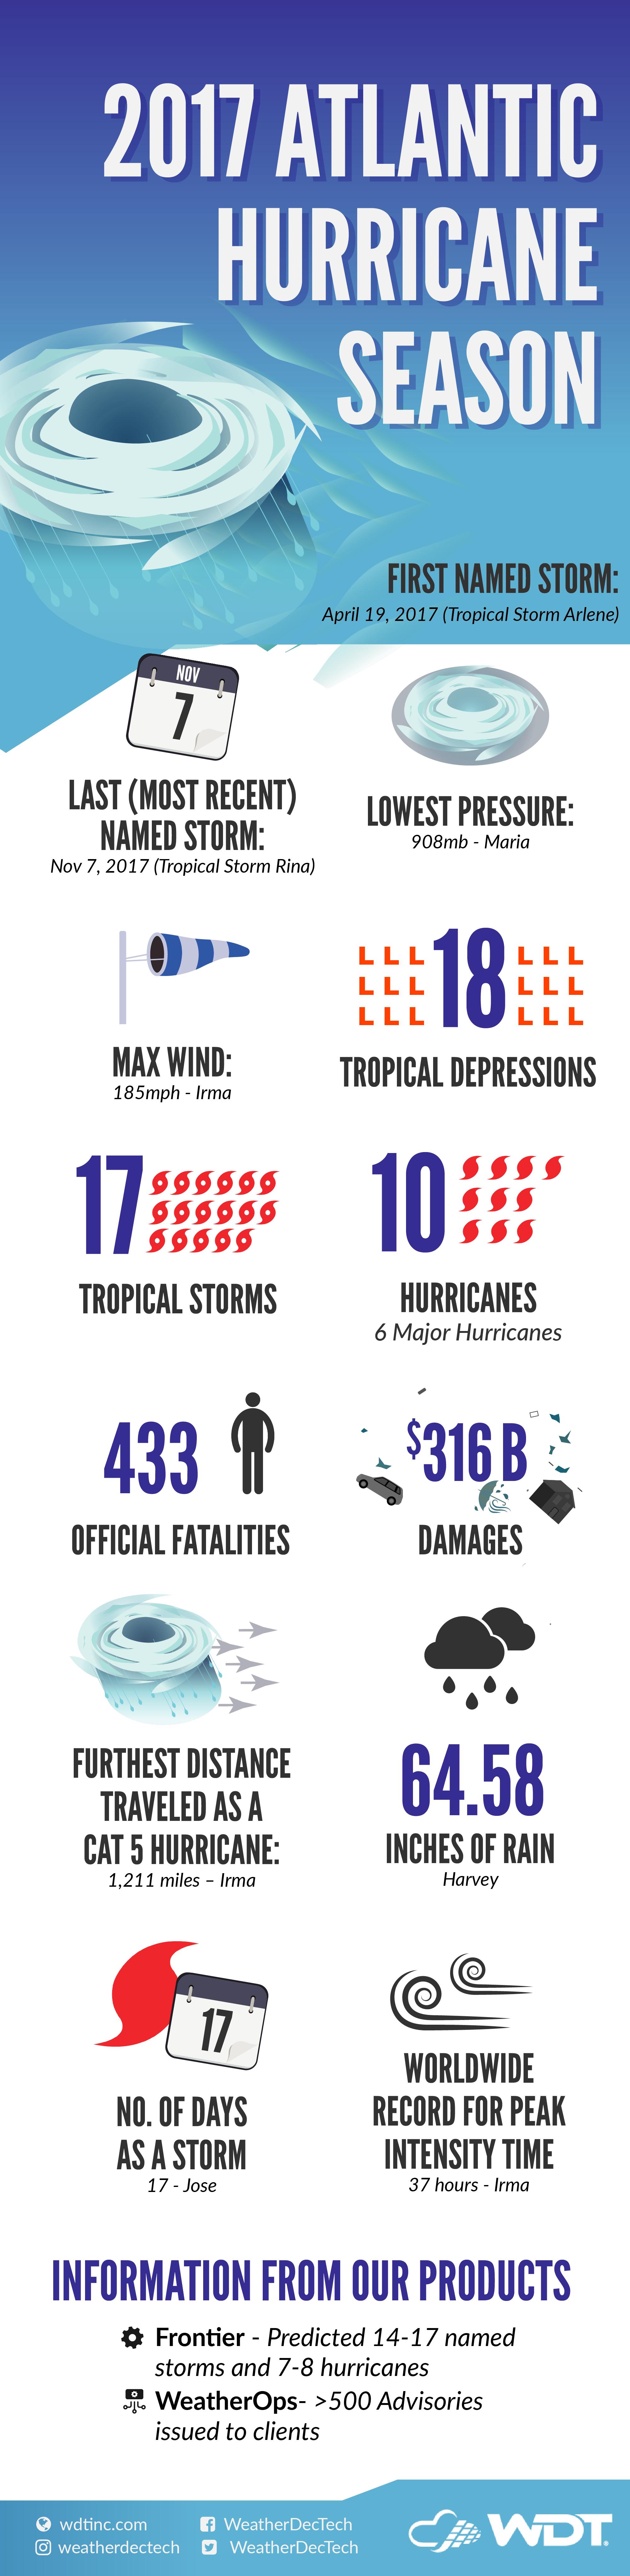 The Entire 2017 Atlantic Hurricane Season in One Infographic